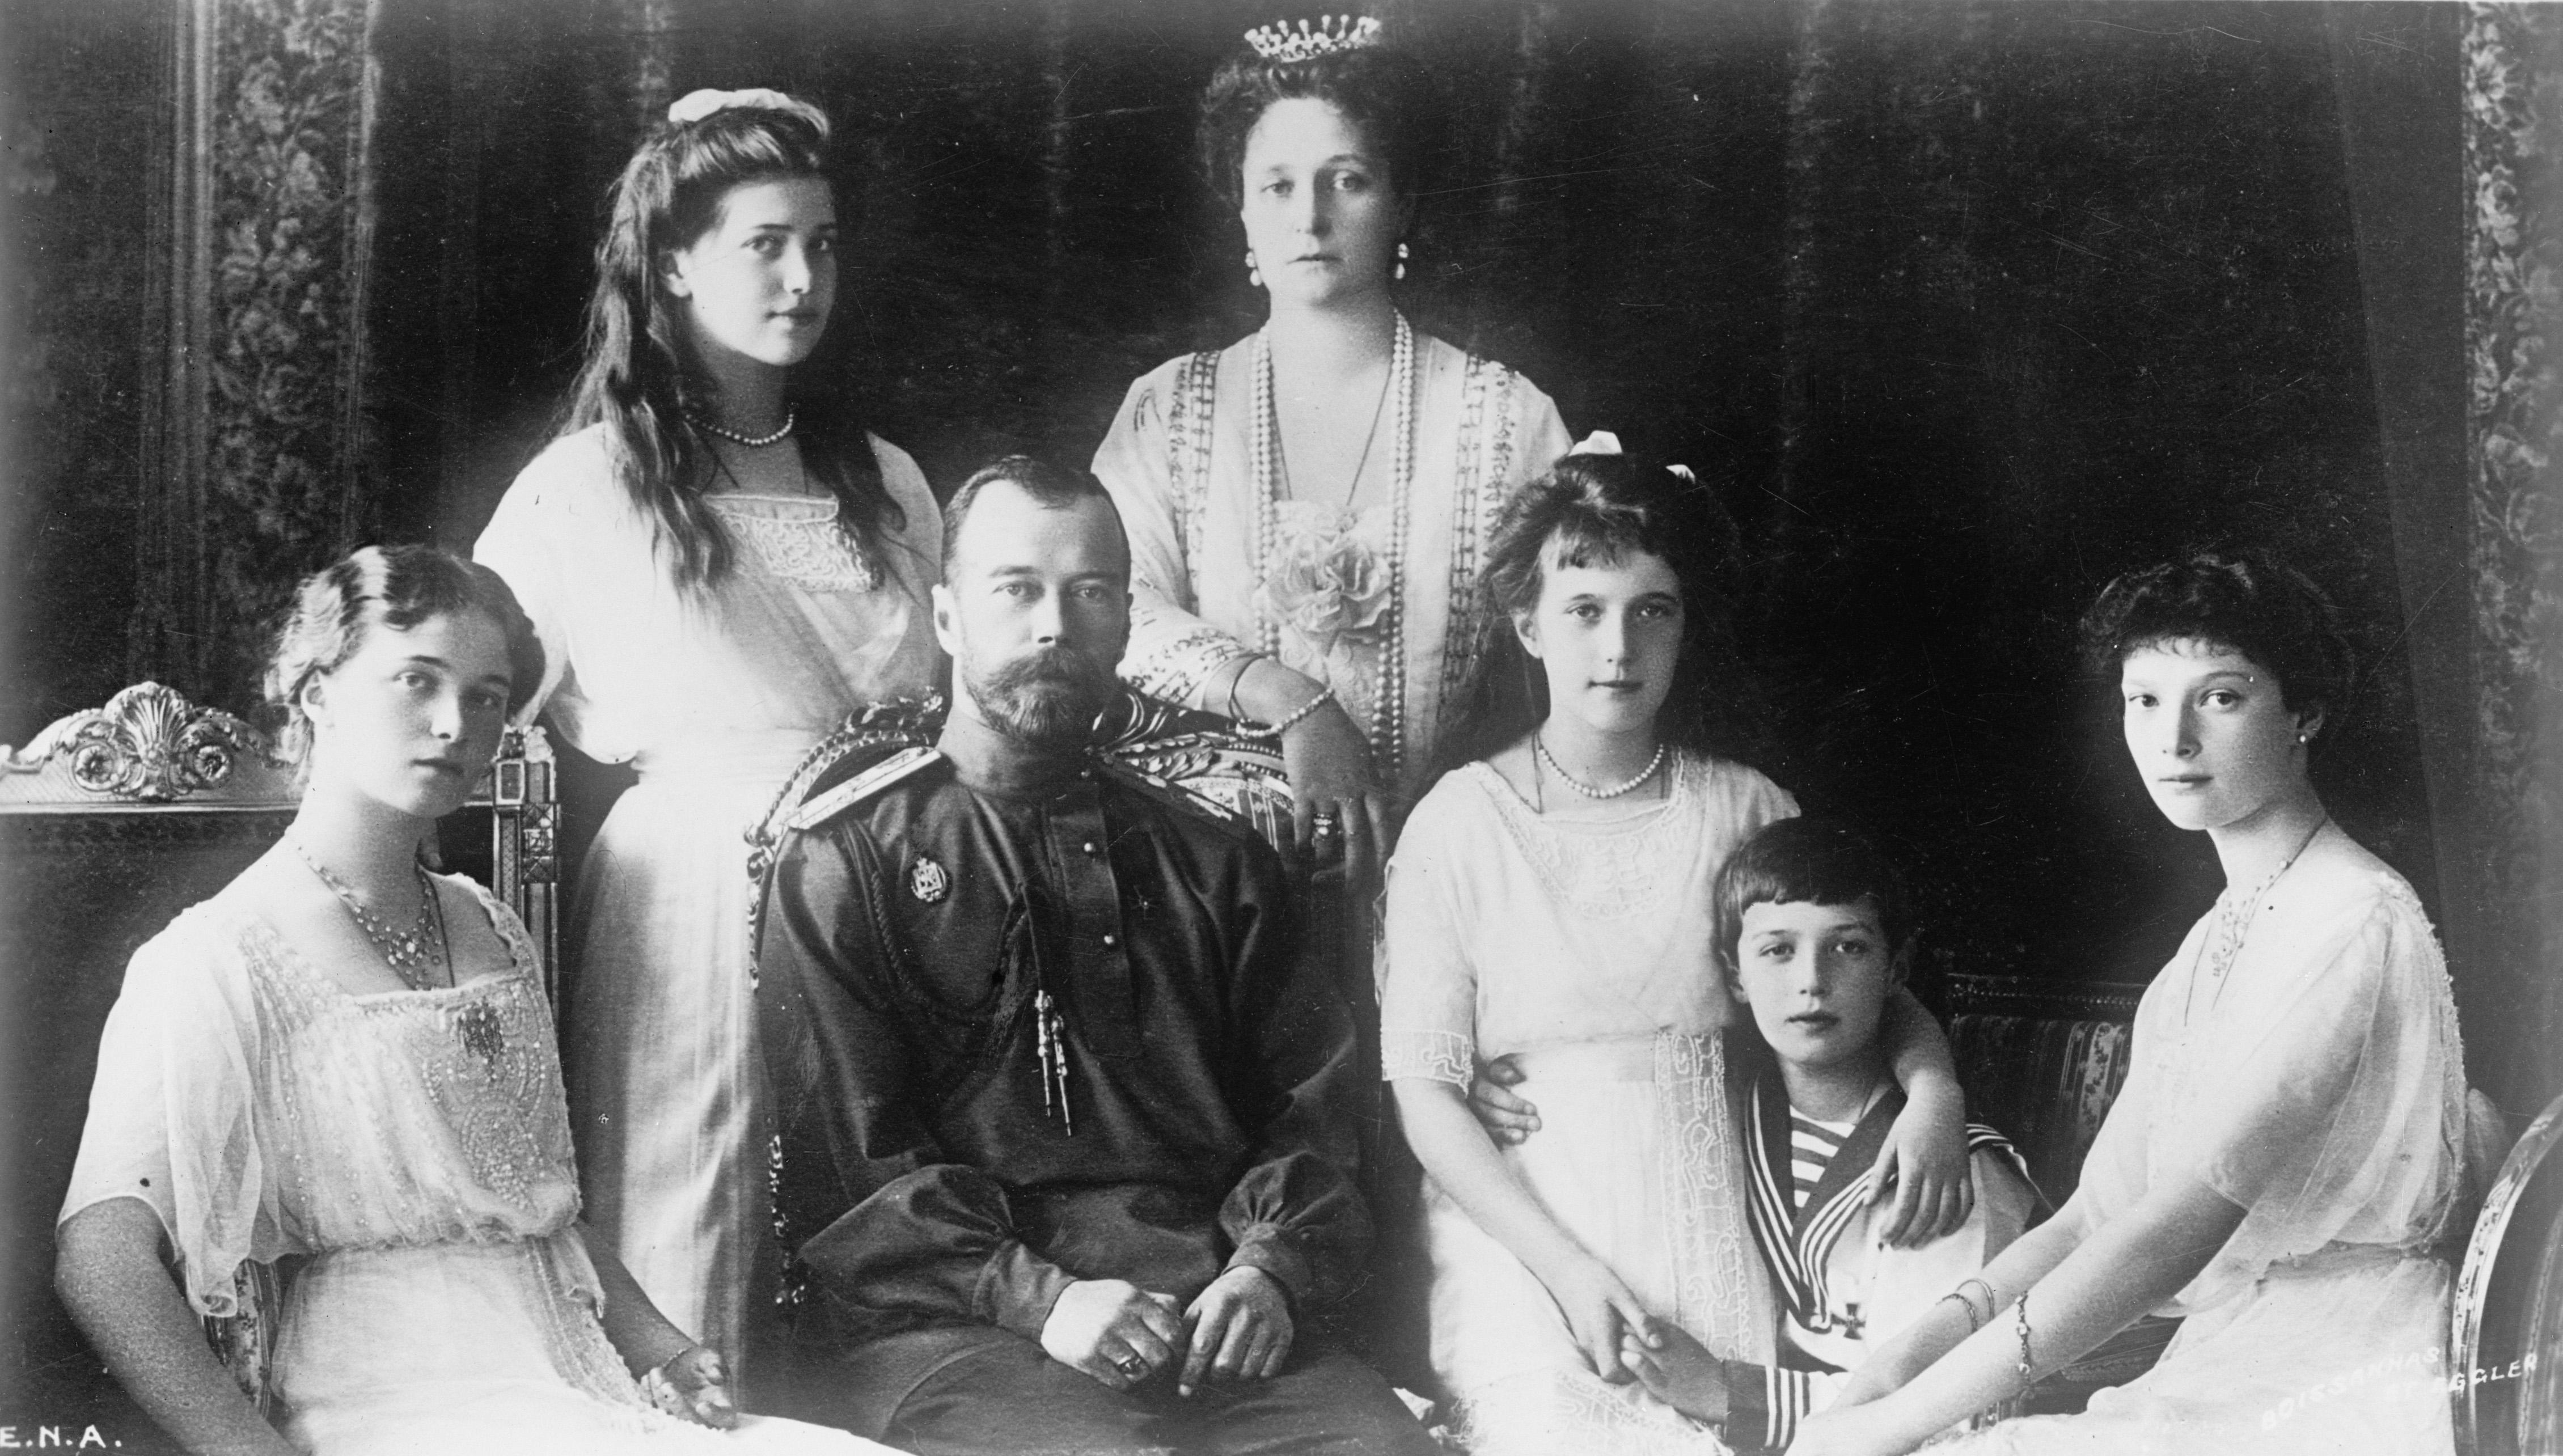 Gobierno de Nicolas Maduro. - Página 5 Romanovs1914